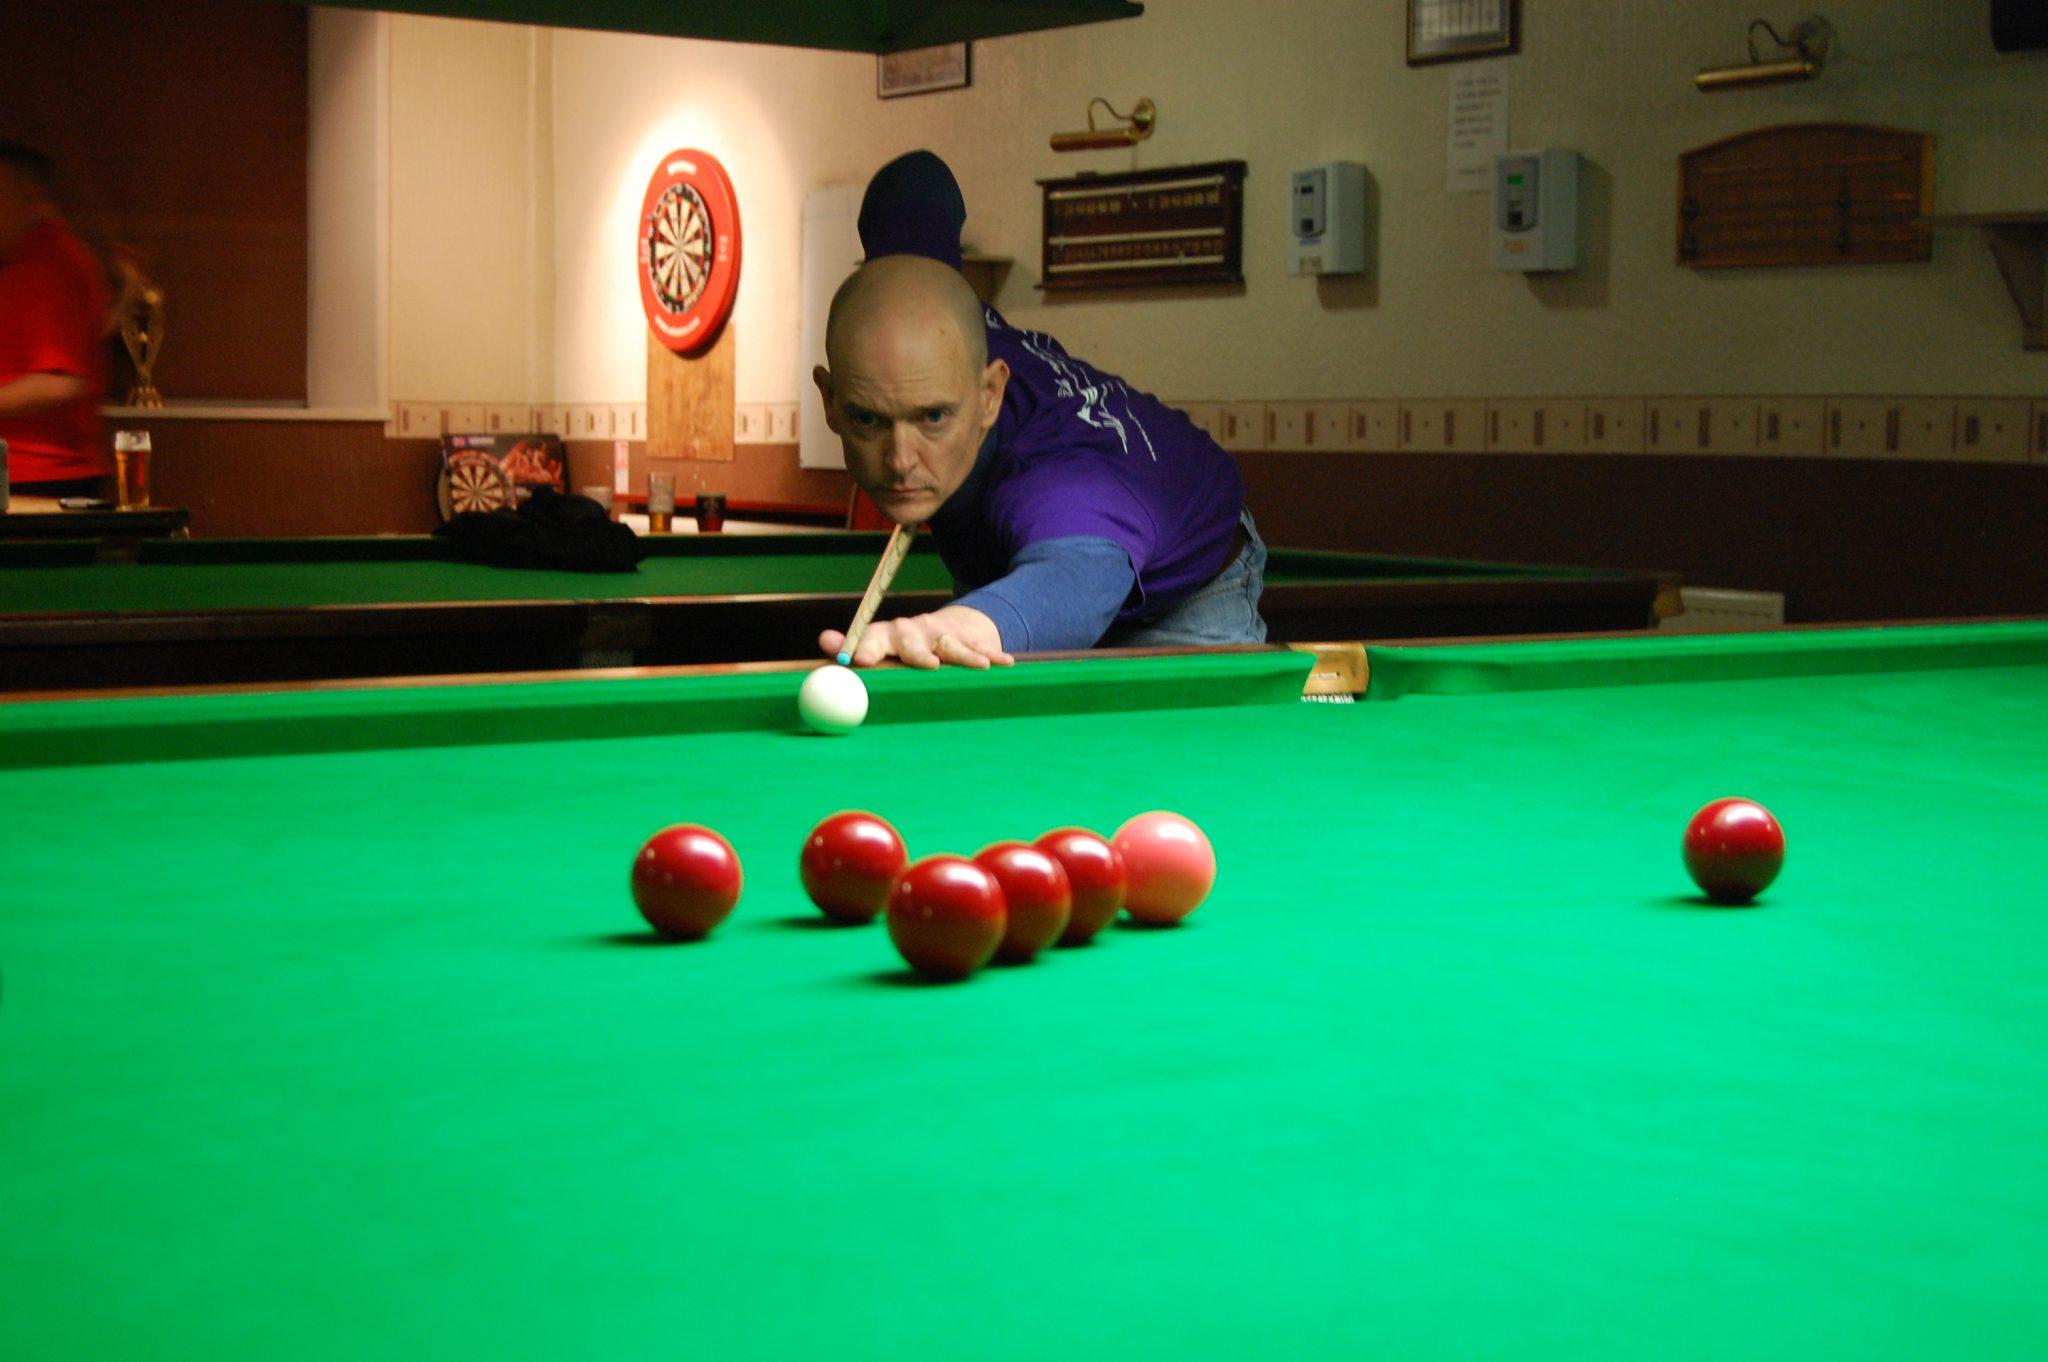 Jon hits form at Kirkby Cross Snooker Club